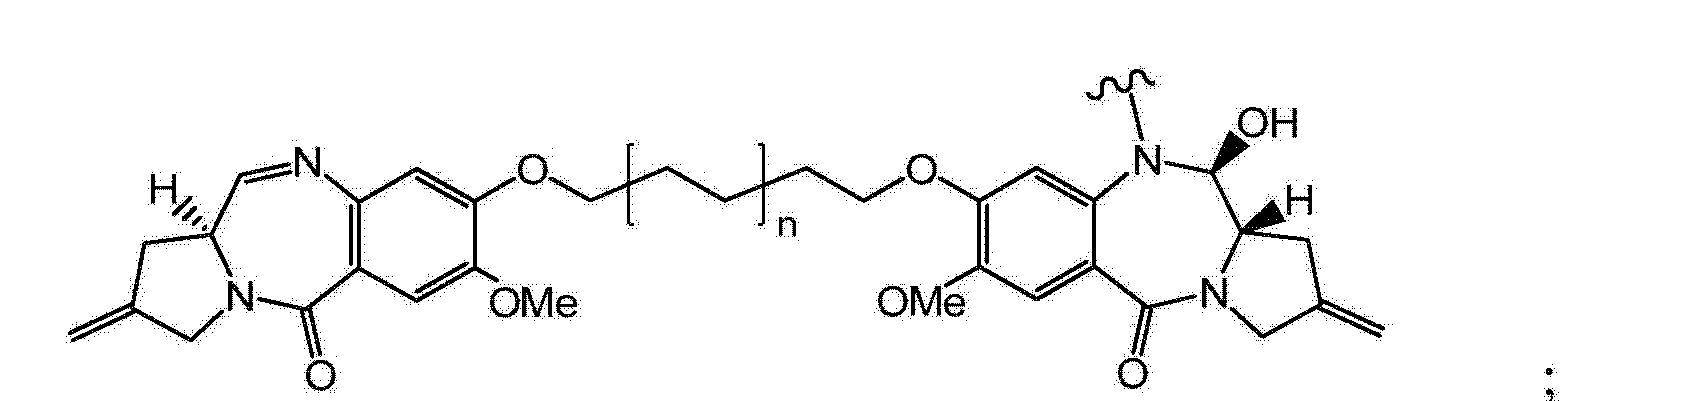 Figure CN104411721AD00151